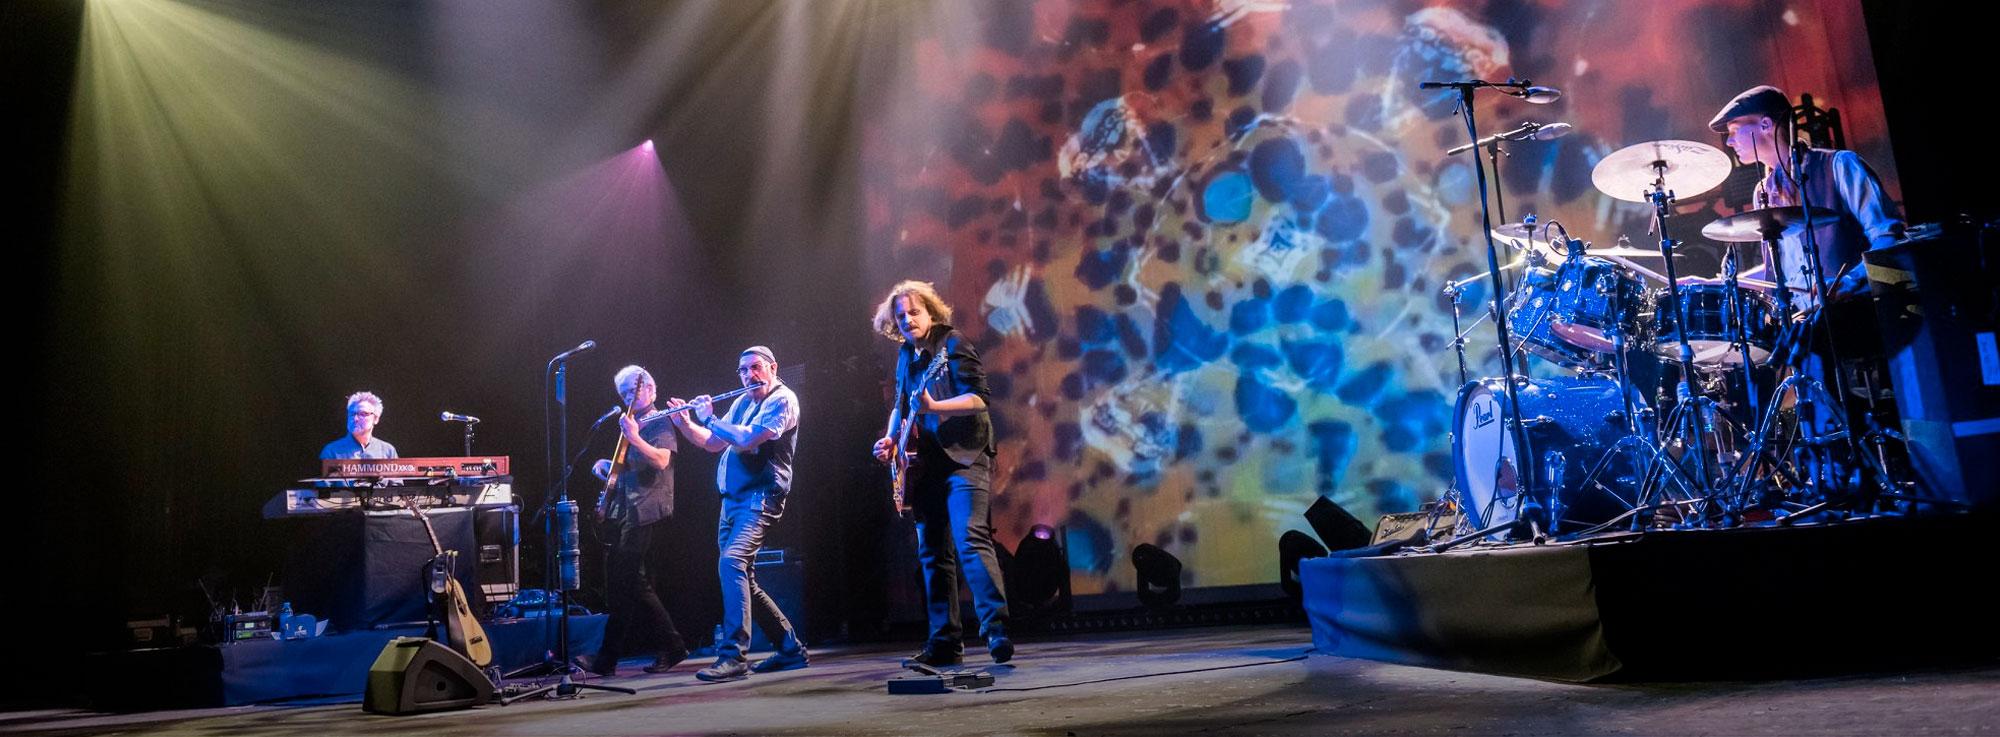 Molfetta: Jethro Tull - 50th Anniversary Tour Europe